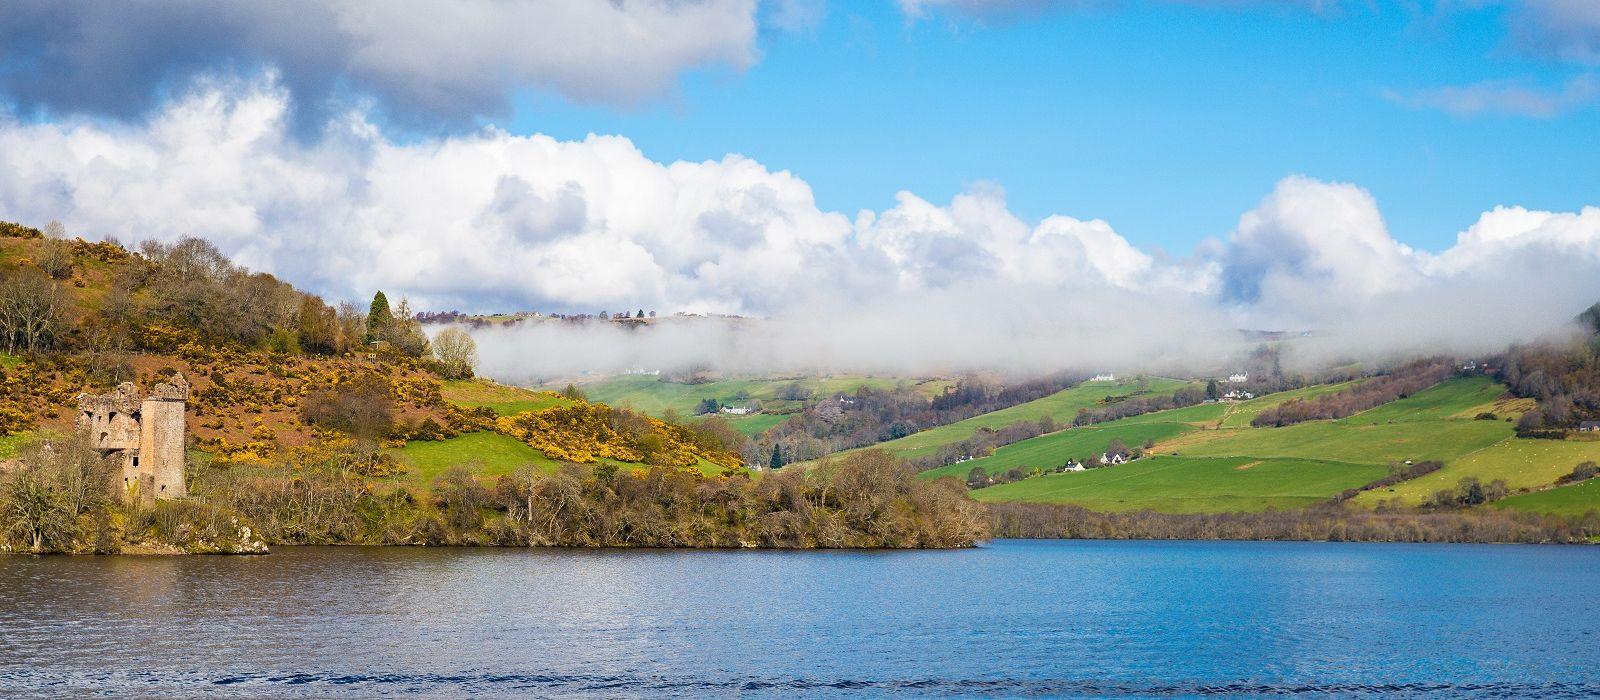 Overland Highlights of Scotland Tour Trip 5